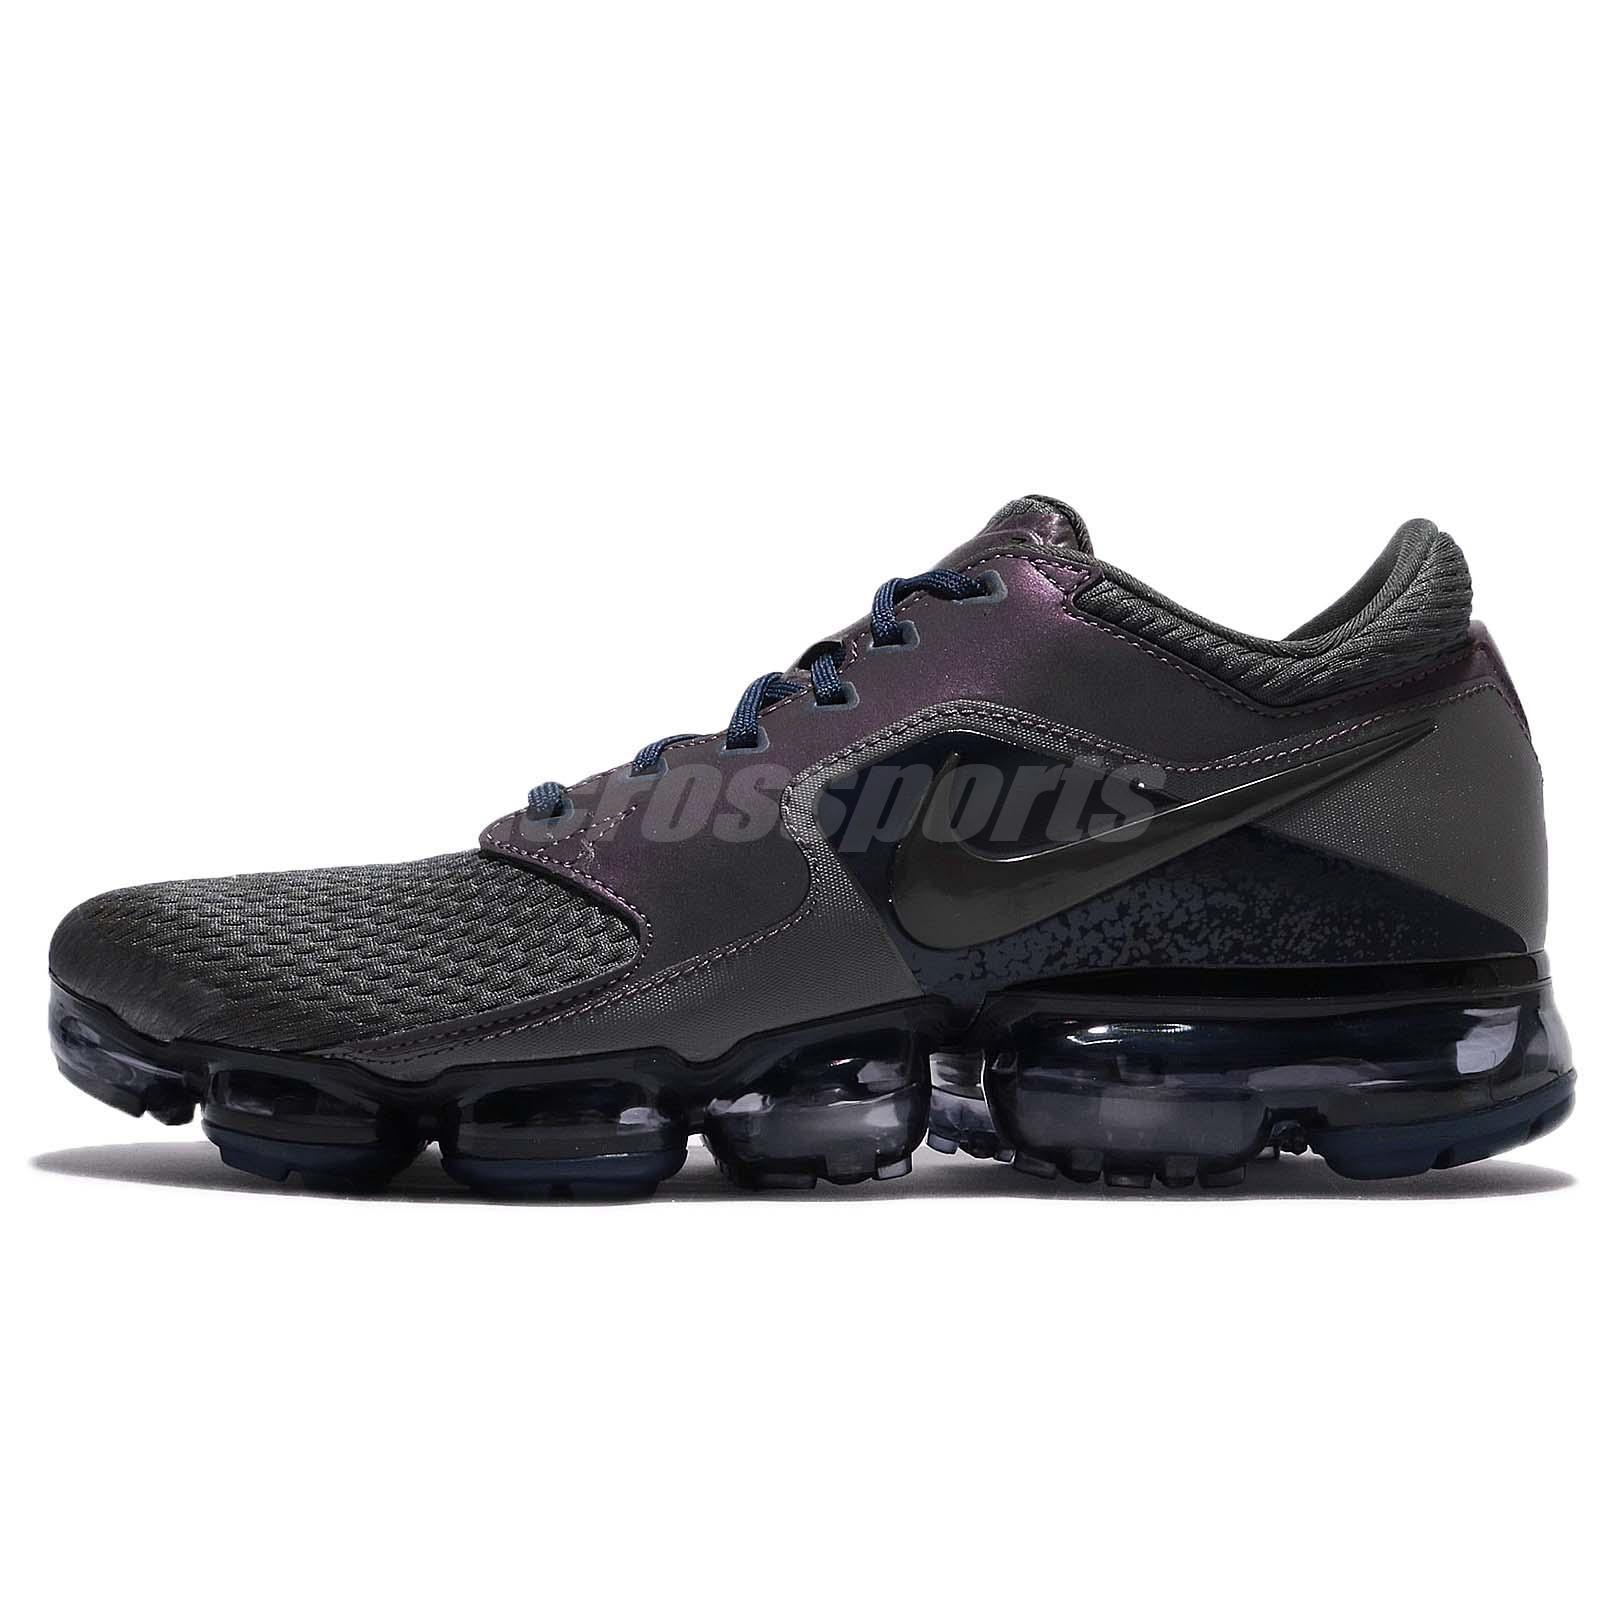 best service f2191 11dc8 Nike Air Vapormax R Midnight Fog Blue Men Running Shoes Sneakers AJ4469-002